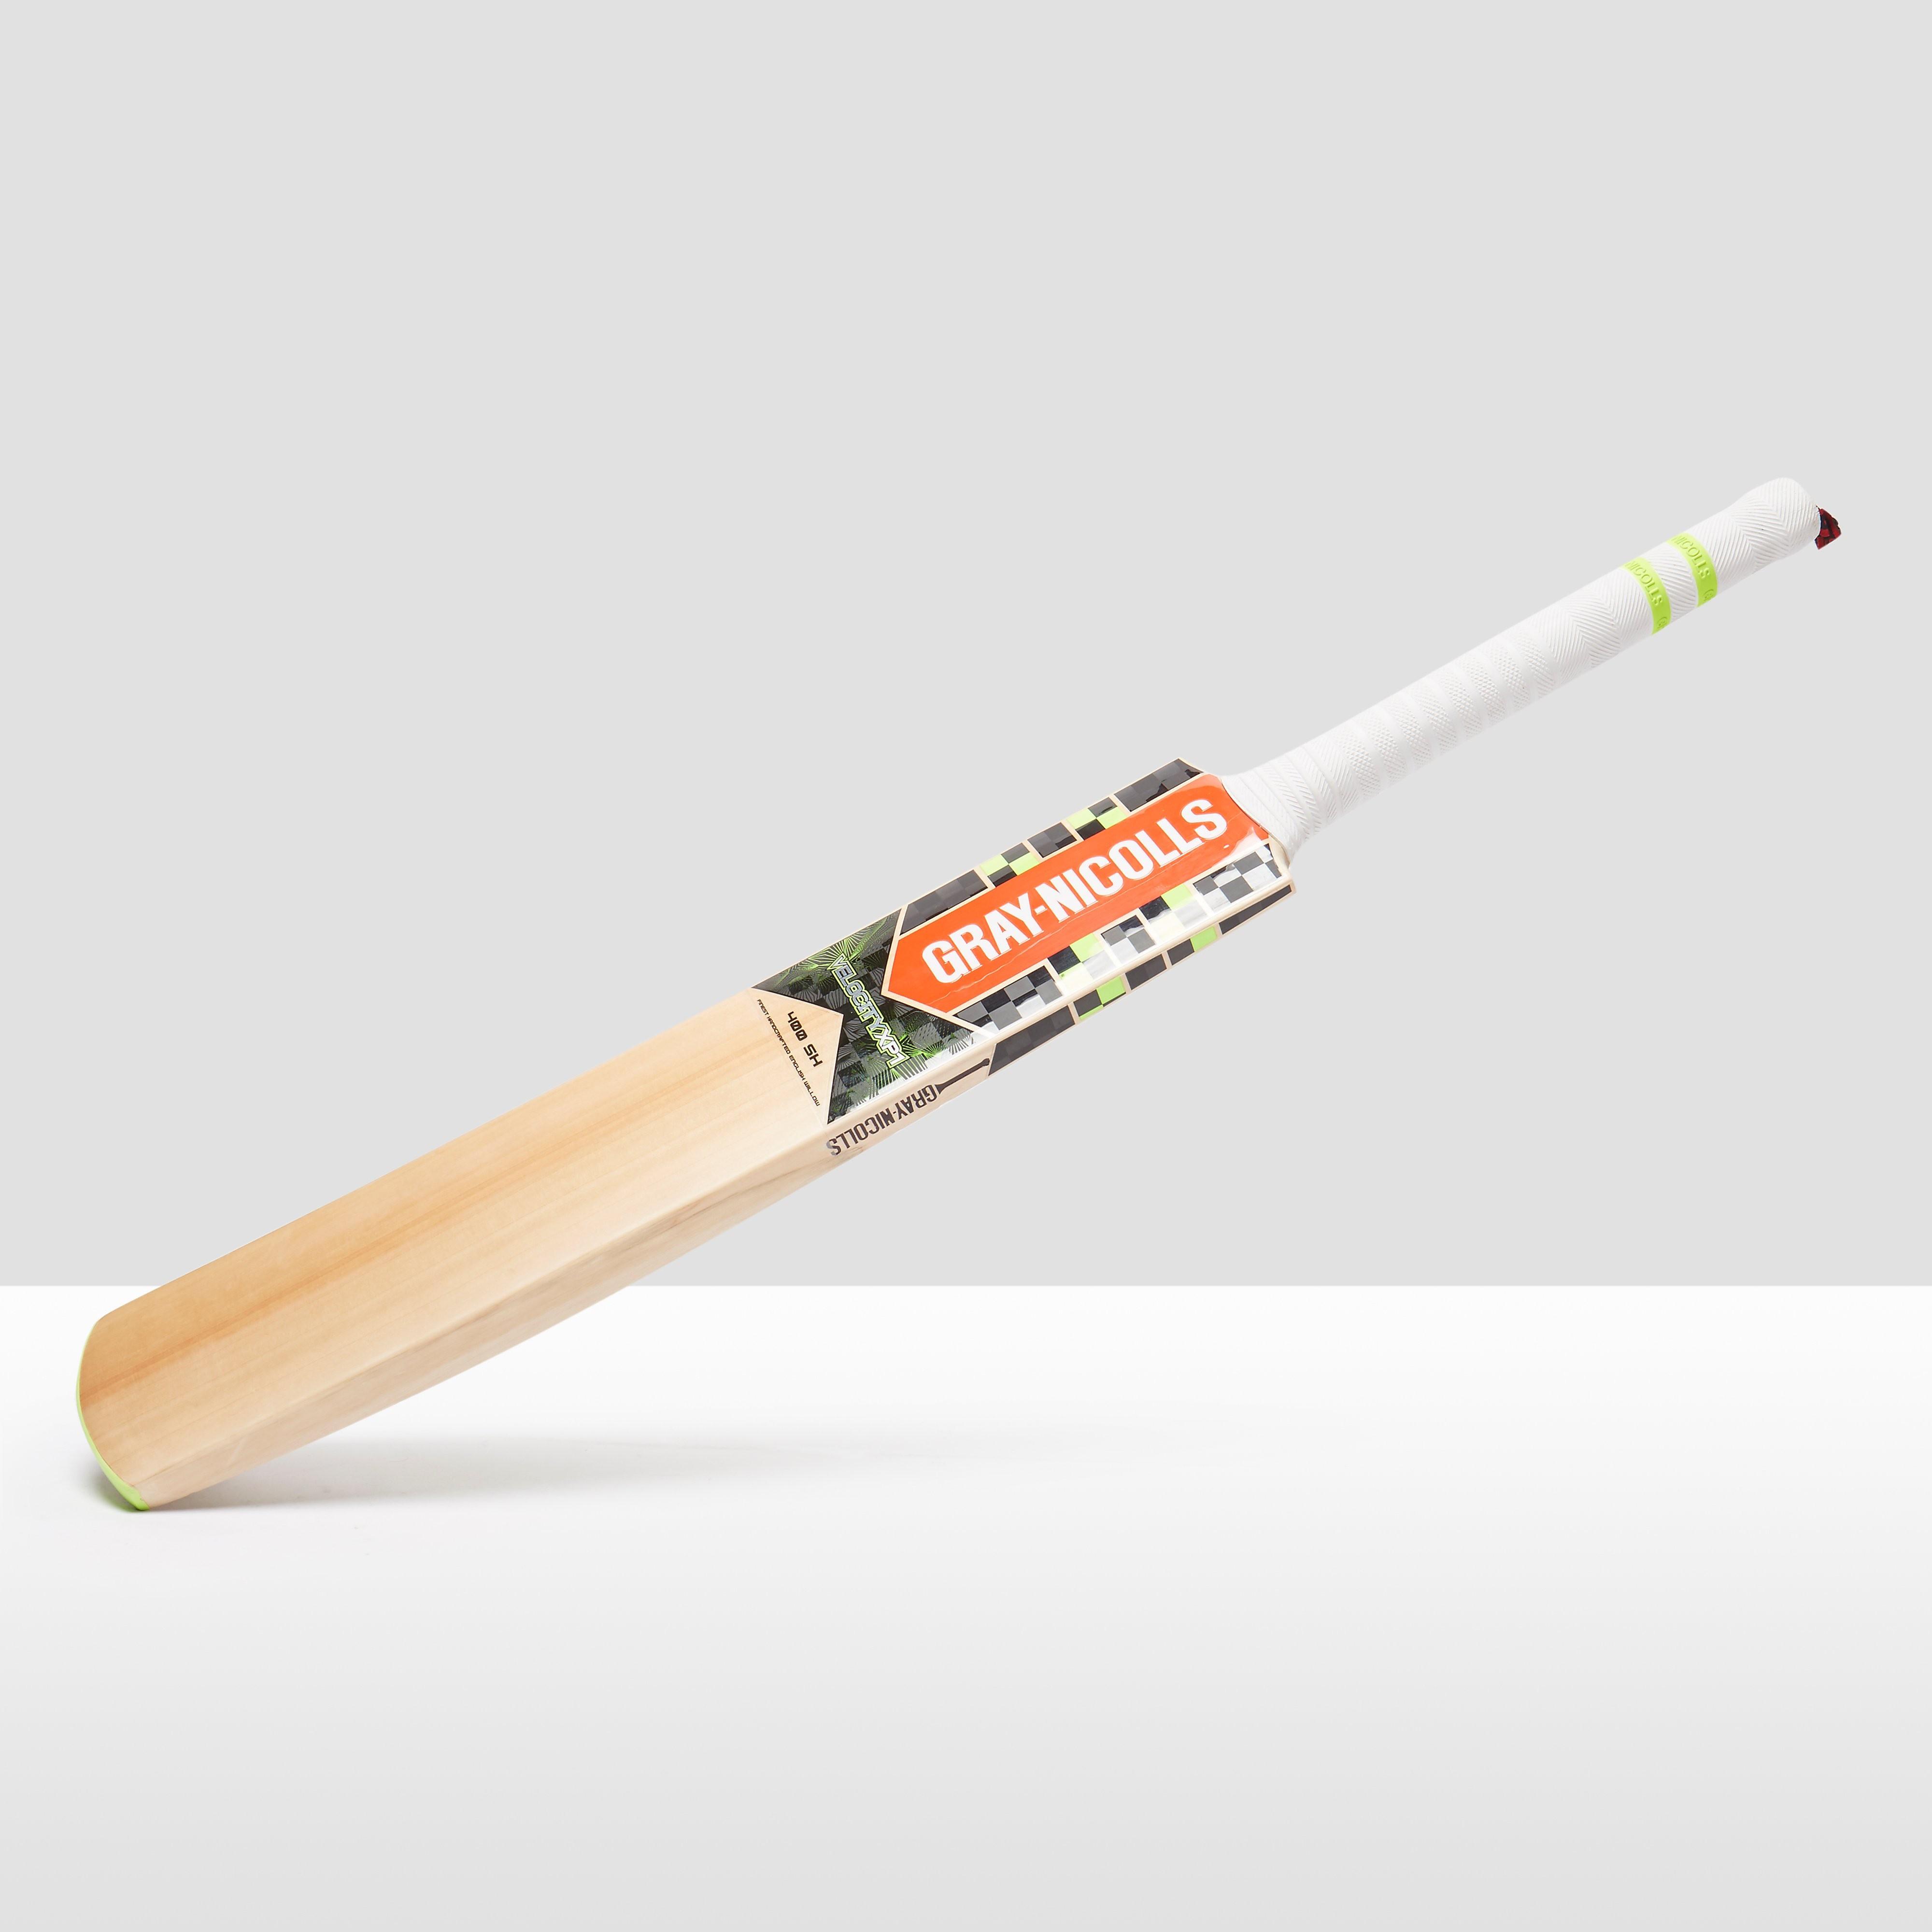 Gray Nicolls Velocity XP1 400 Men's Cricket Bat